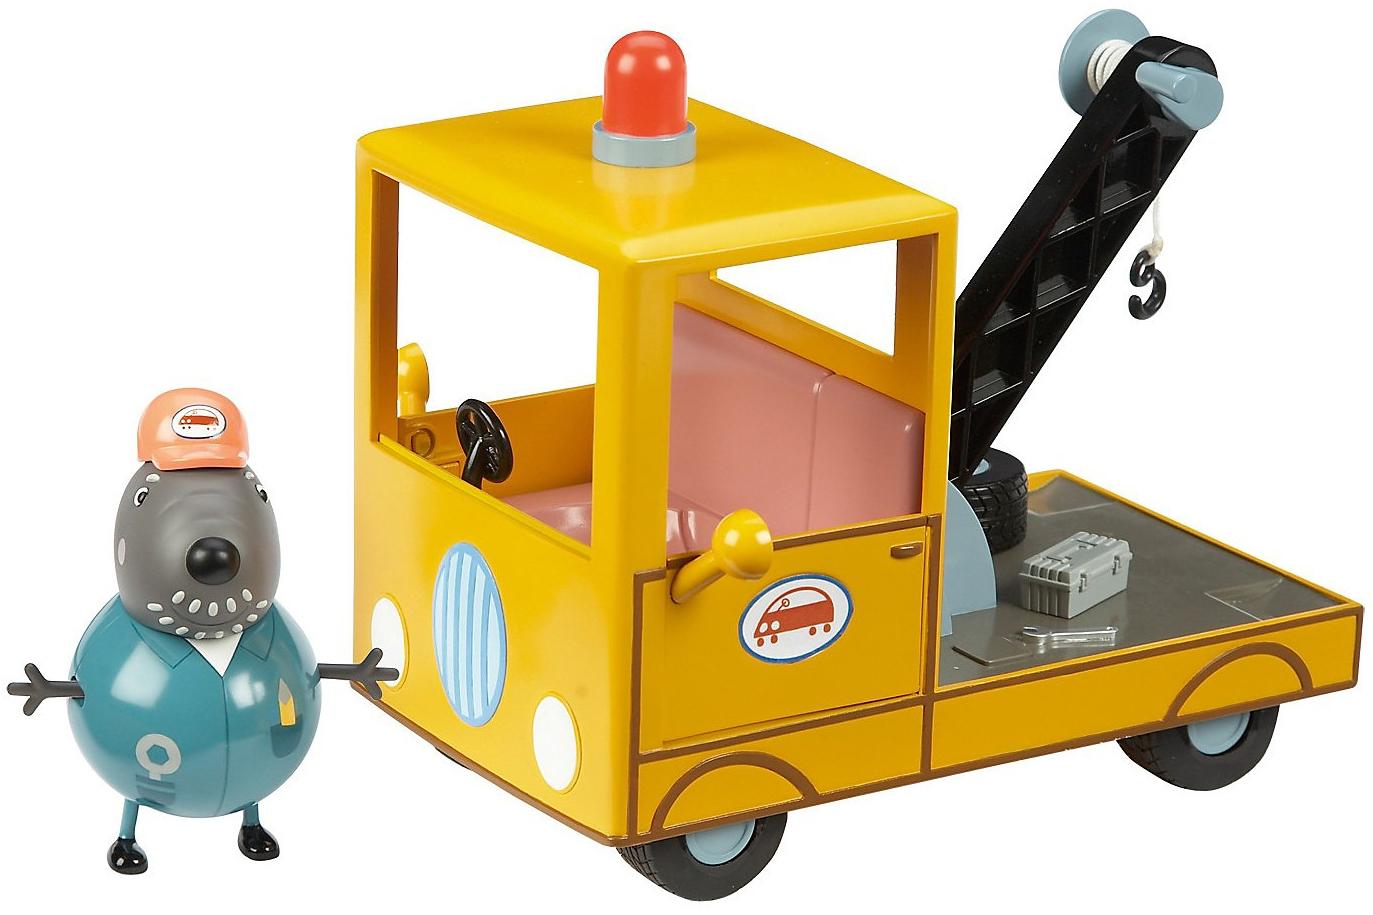 Peppa Pig Peppa Pig Машина Погрузчик peppa pig игровой набор спортивная машина 24068 4 фигурки